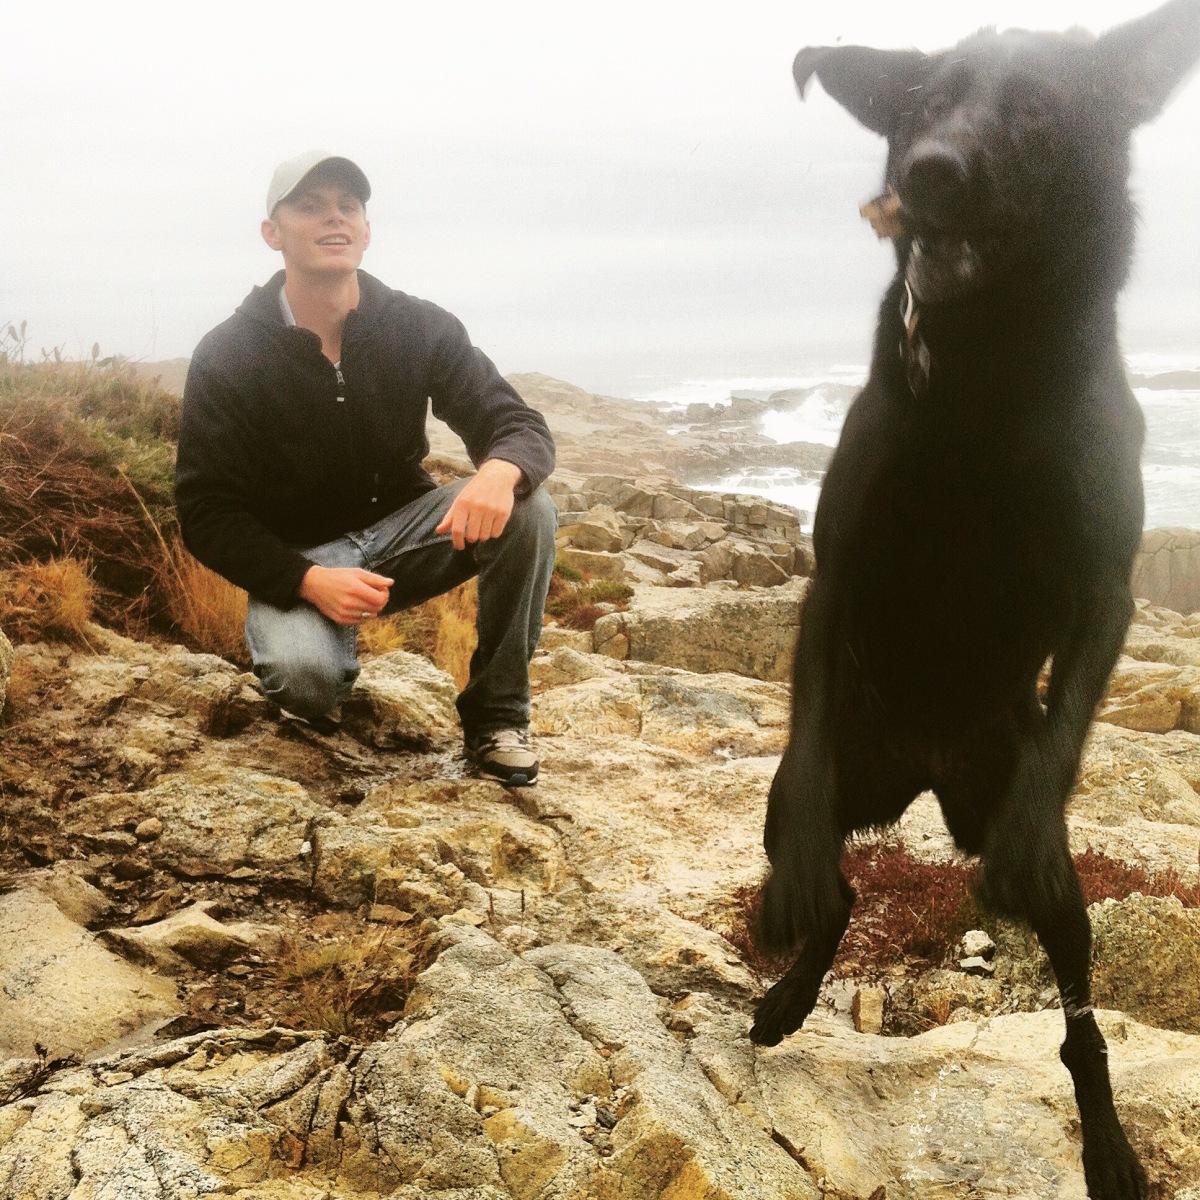 Duncan's Cove off-leash dog-friendly